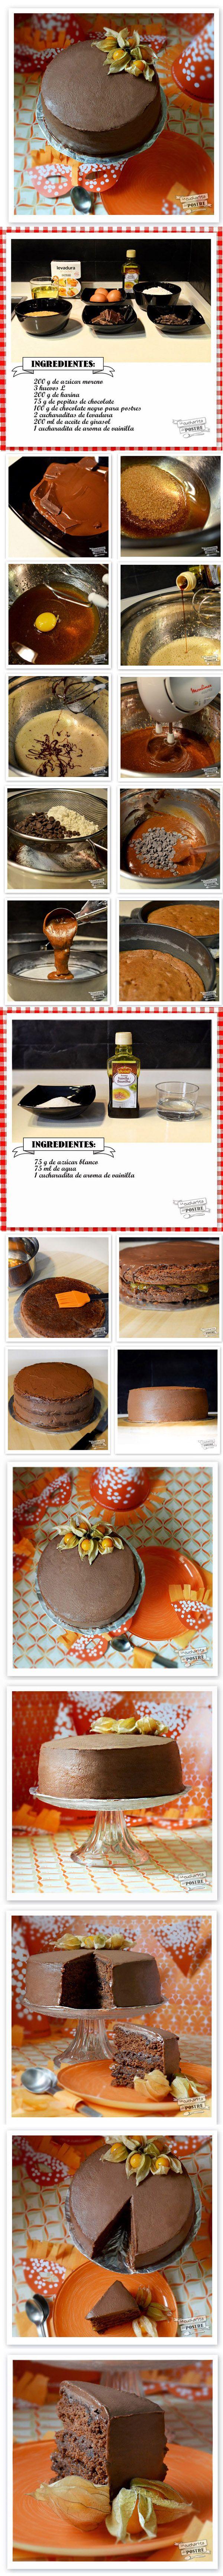 Tarta de naranja y chocolate / http://lacucharitadepostre.blogspot.com.es/